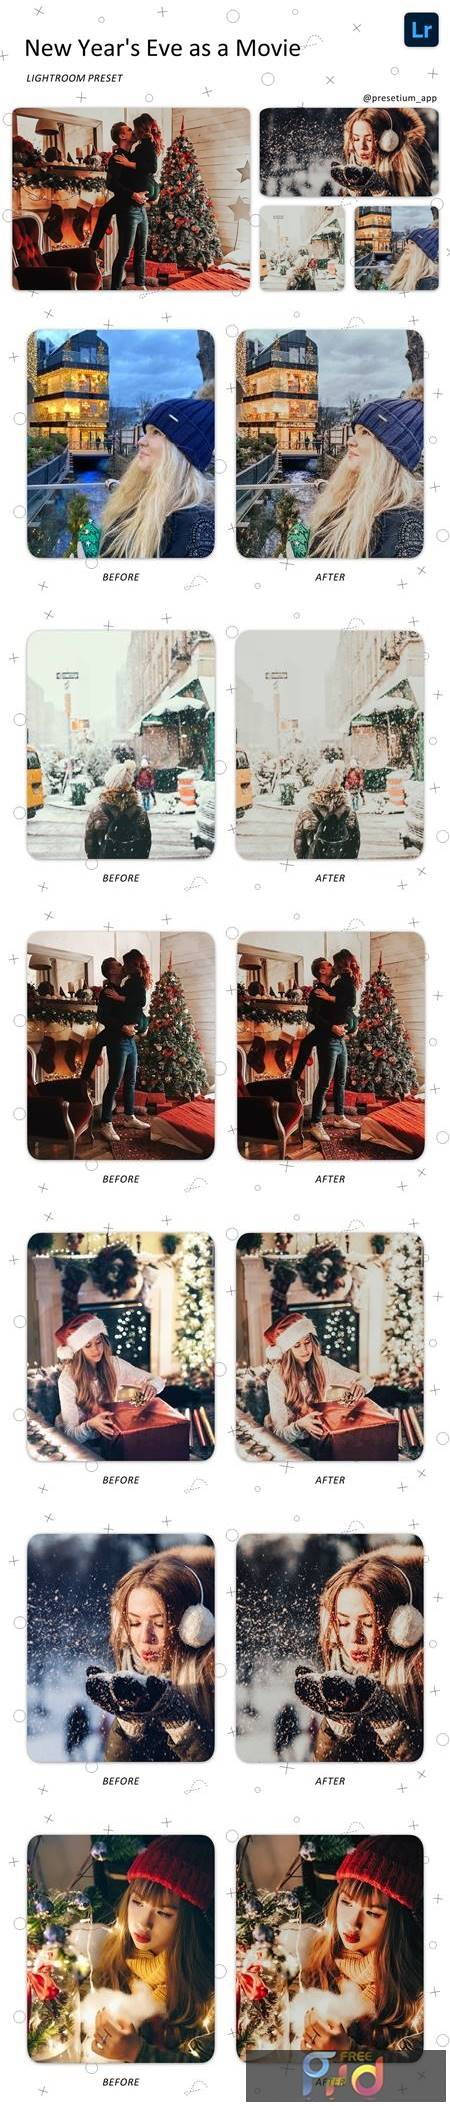 New Year - Lightroom Presets 5223813 1